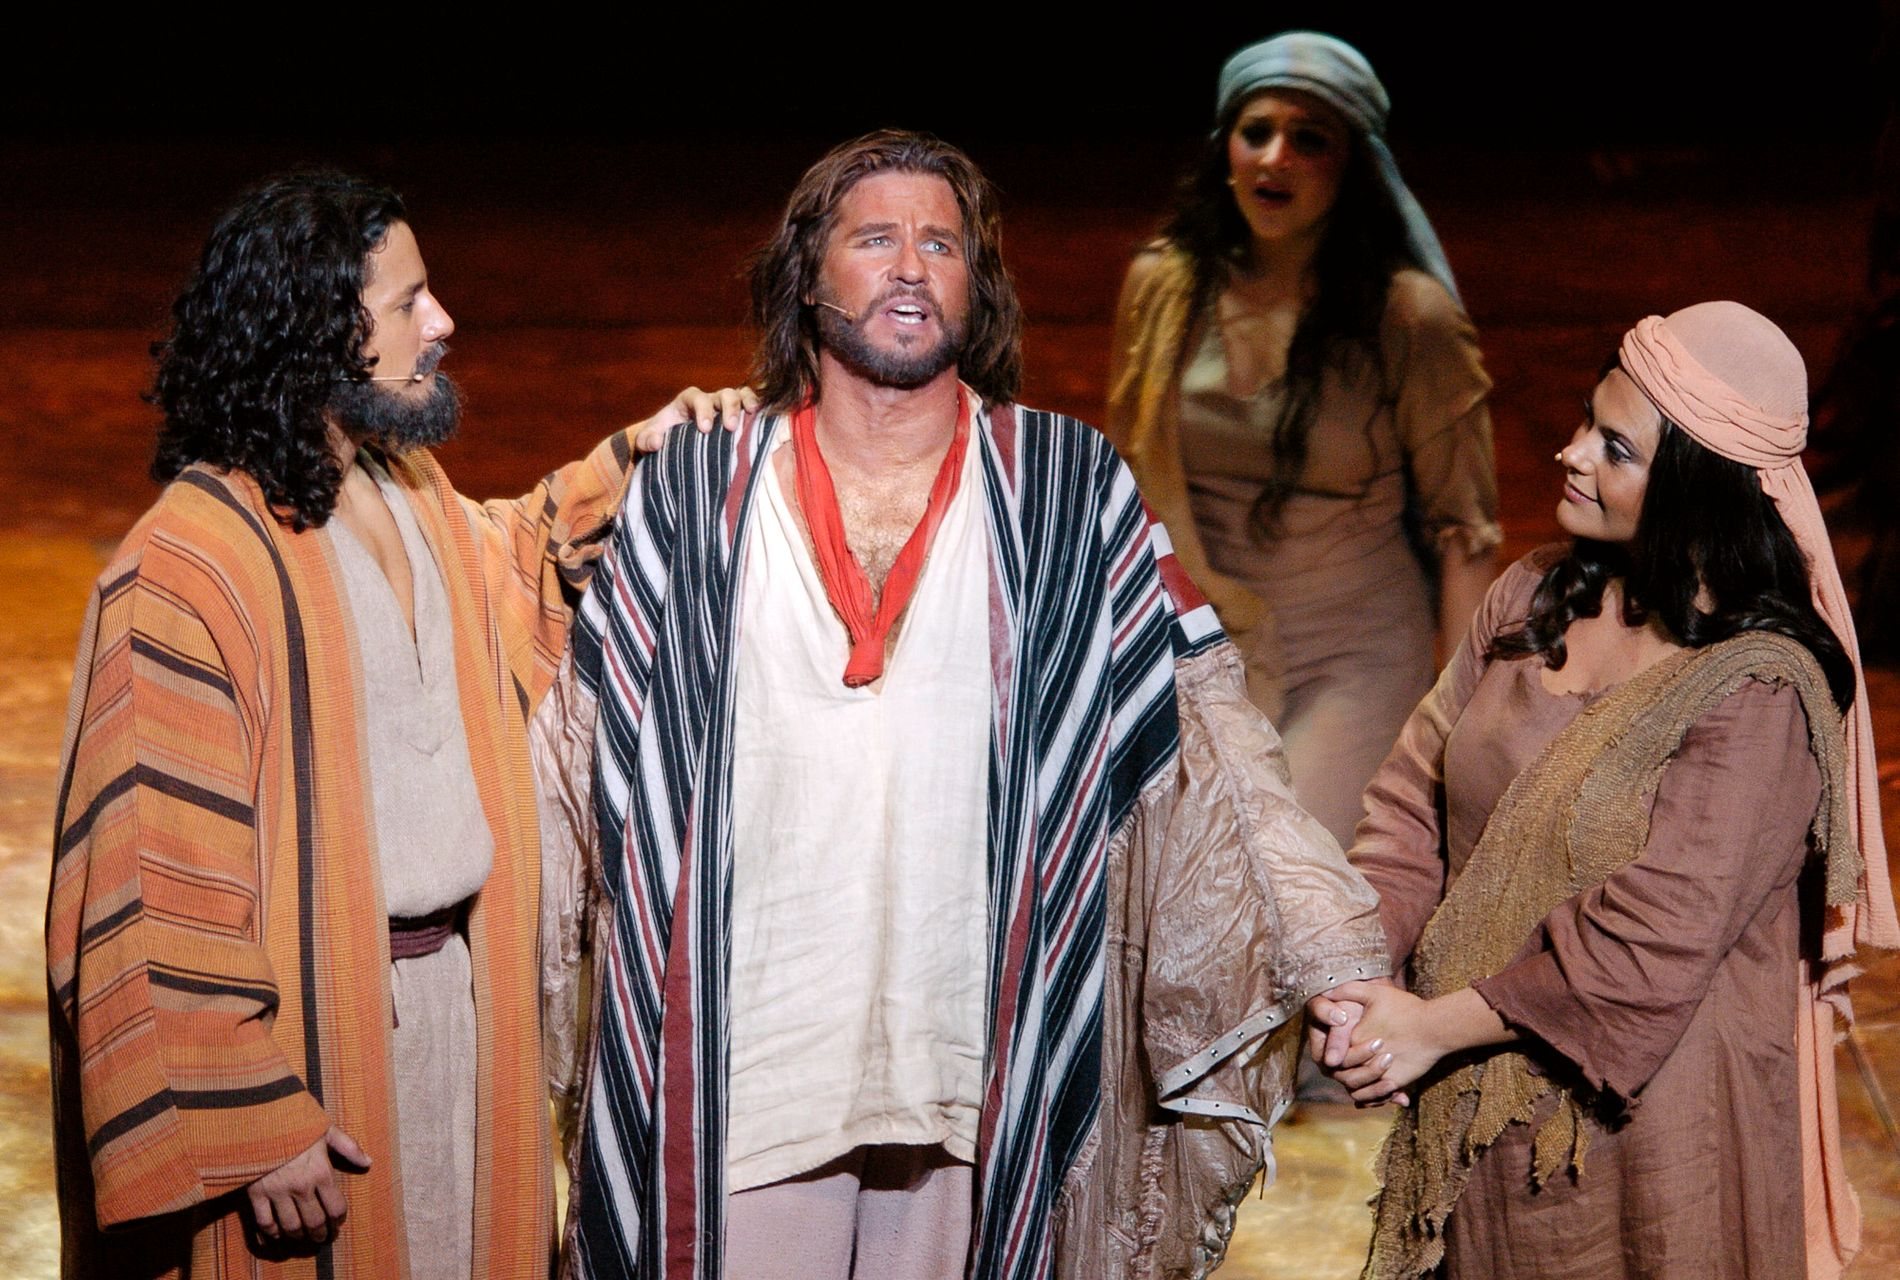 PÅ SCNENE: Val Kilmer (i midten) hadde rollen som Moses i musikalen «De ti bud» på Kodak Theatre i Hollywood i 2004.